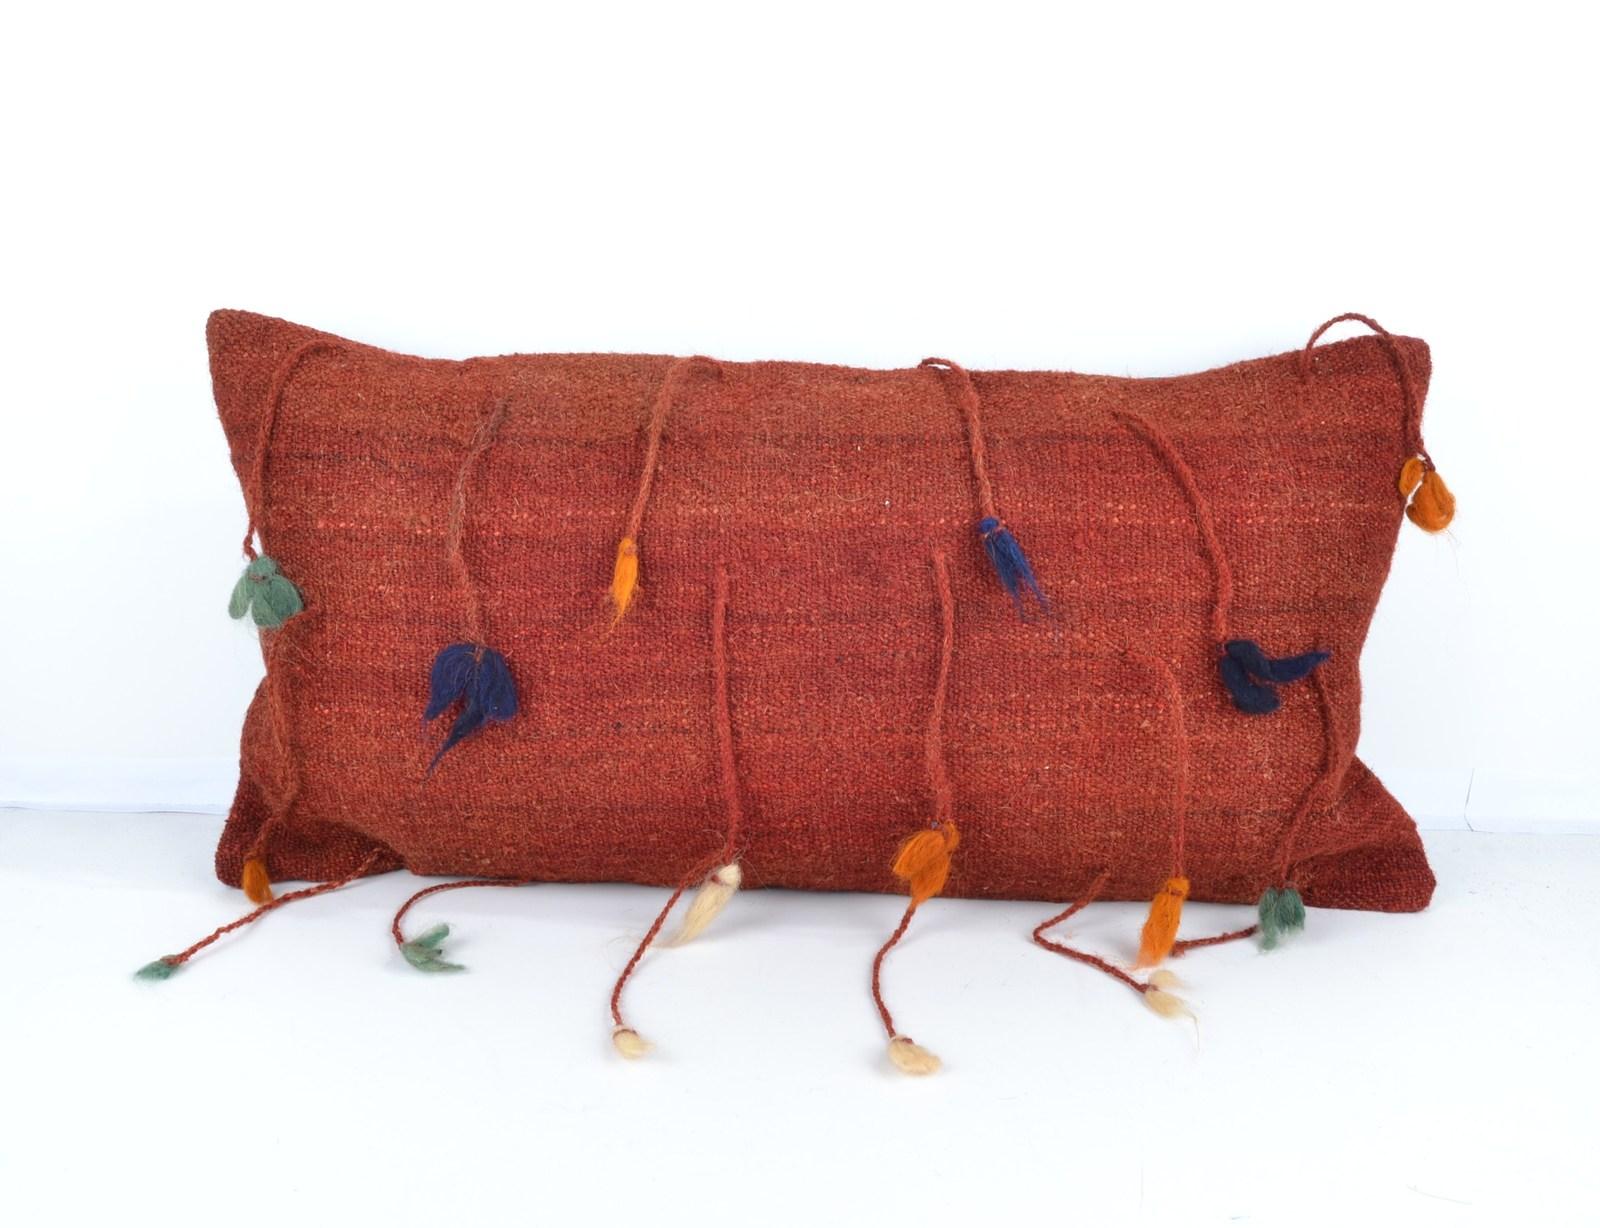 12x24 decorative throw pillows, pillow cover, decorative pillows throw pillow - Pillows